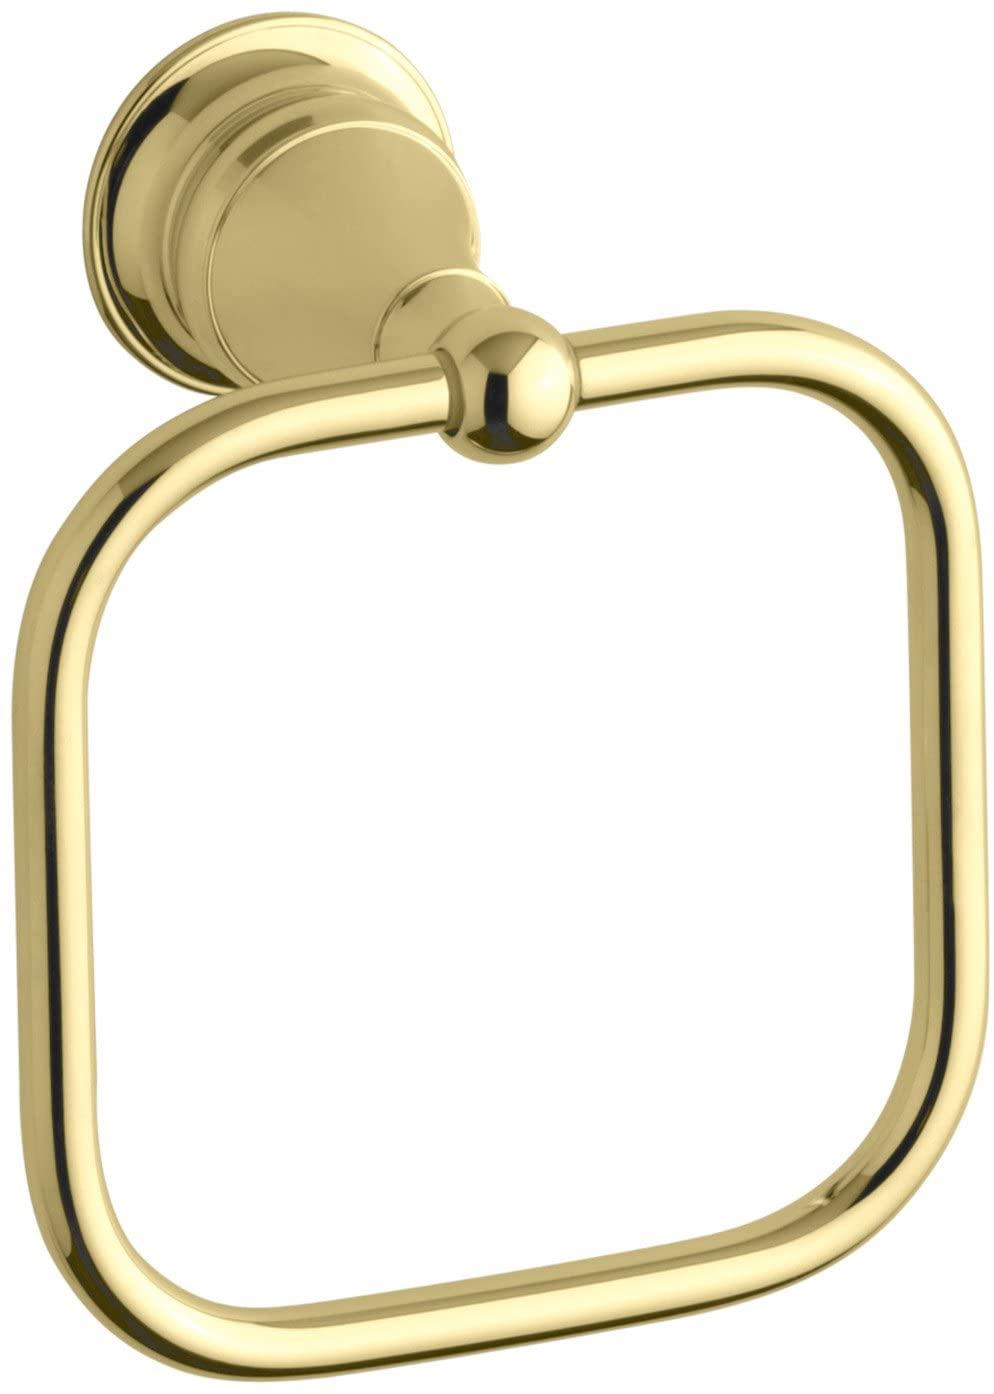 KOHLER K-16140-PB Revival Towel Ring, Vibrant Polished Brass